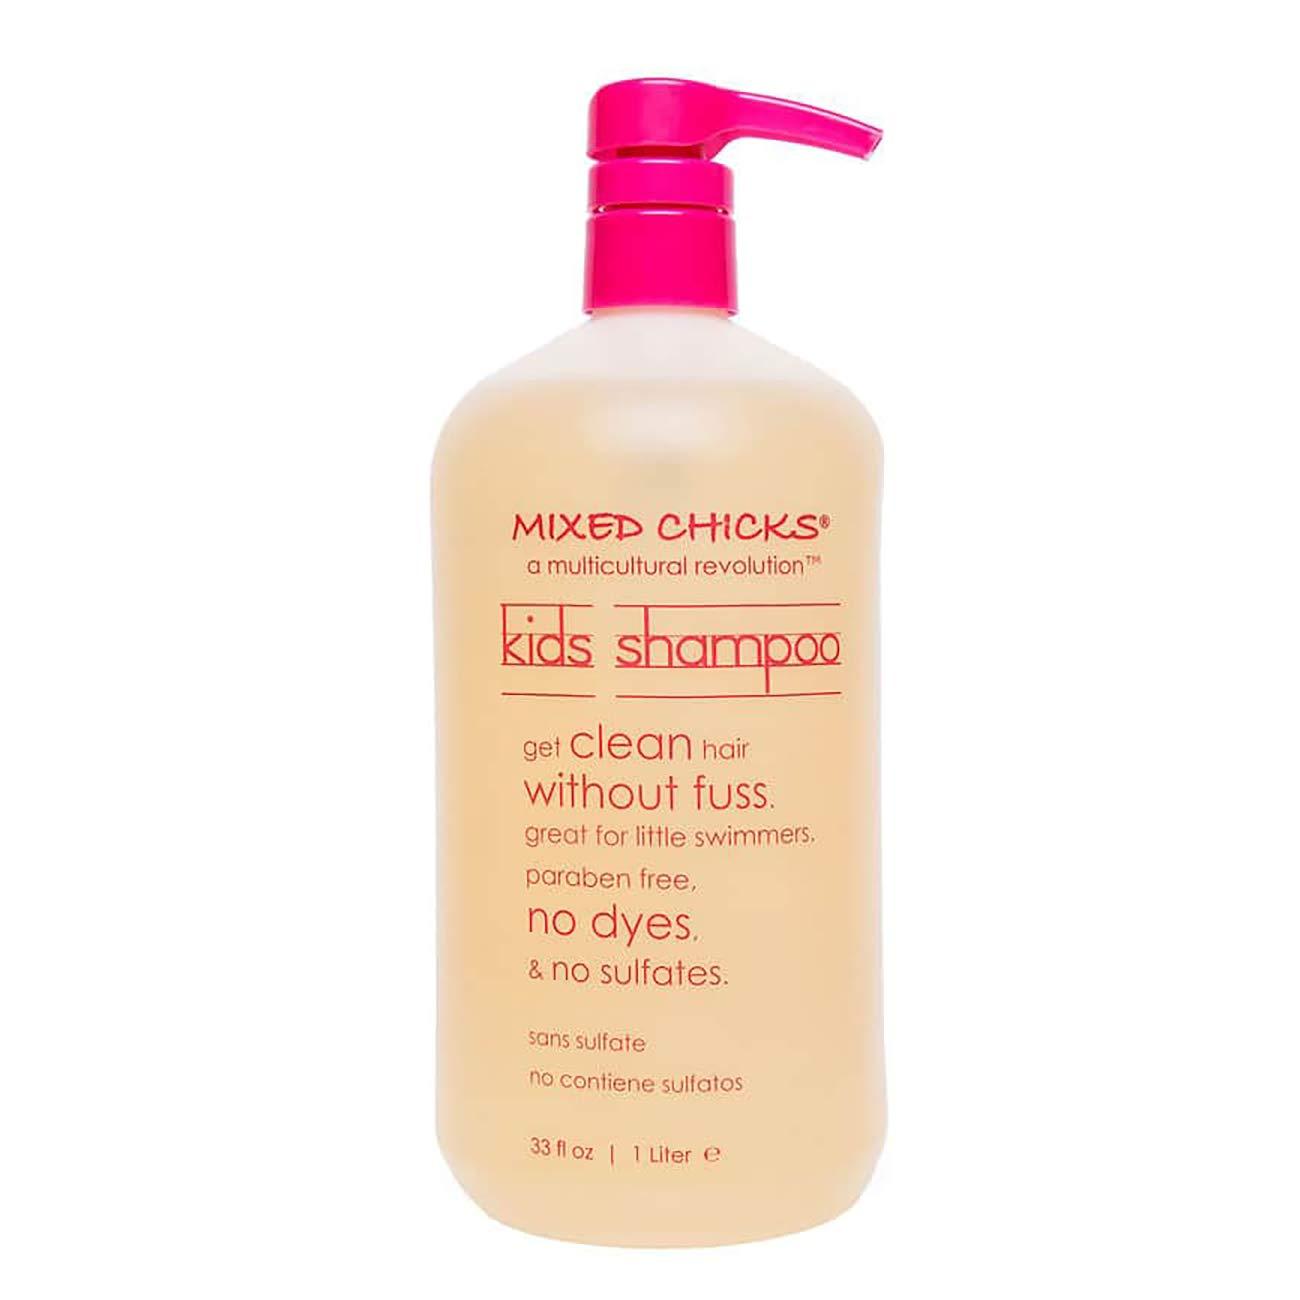 Mixed Chicks Gentle Kids Shampoo – Gentle & Sulfate-free, 33 fl.oz.